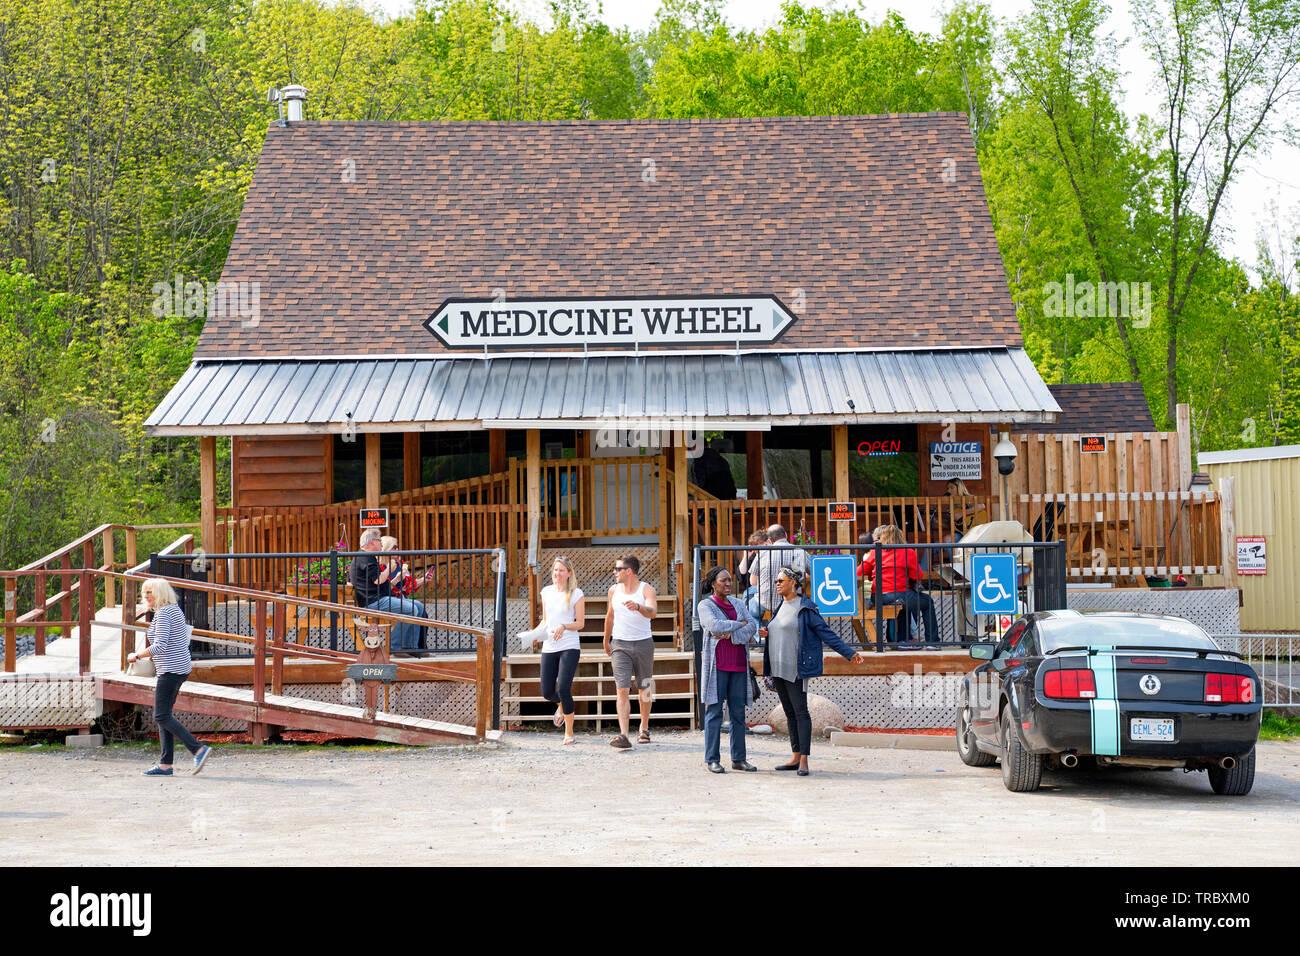 Roue de médecine, un dispensaire de cannabis THC, CBD à Alderville, Ontario, Canada Photo Stock